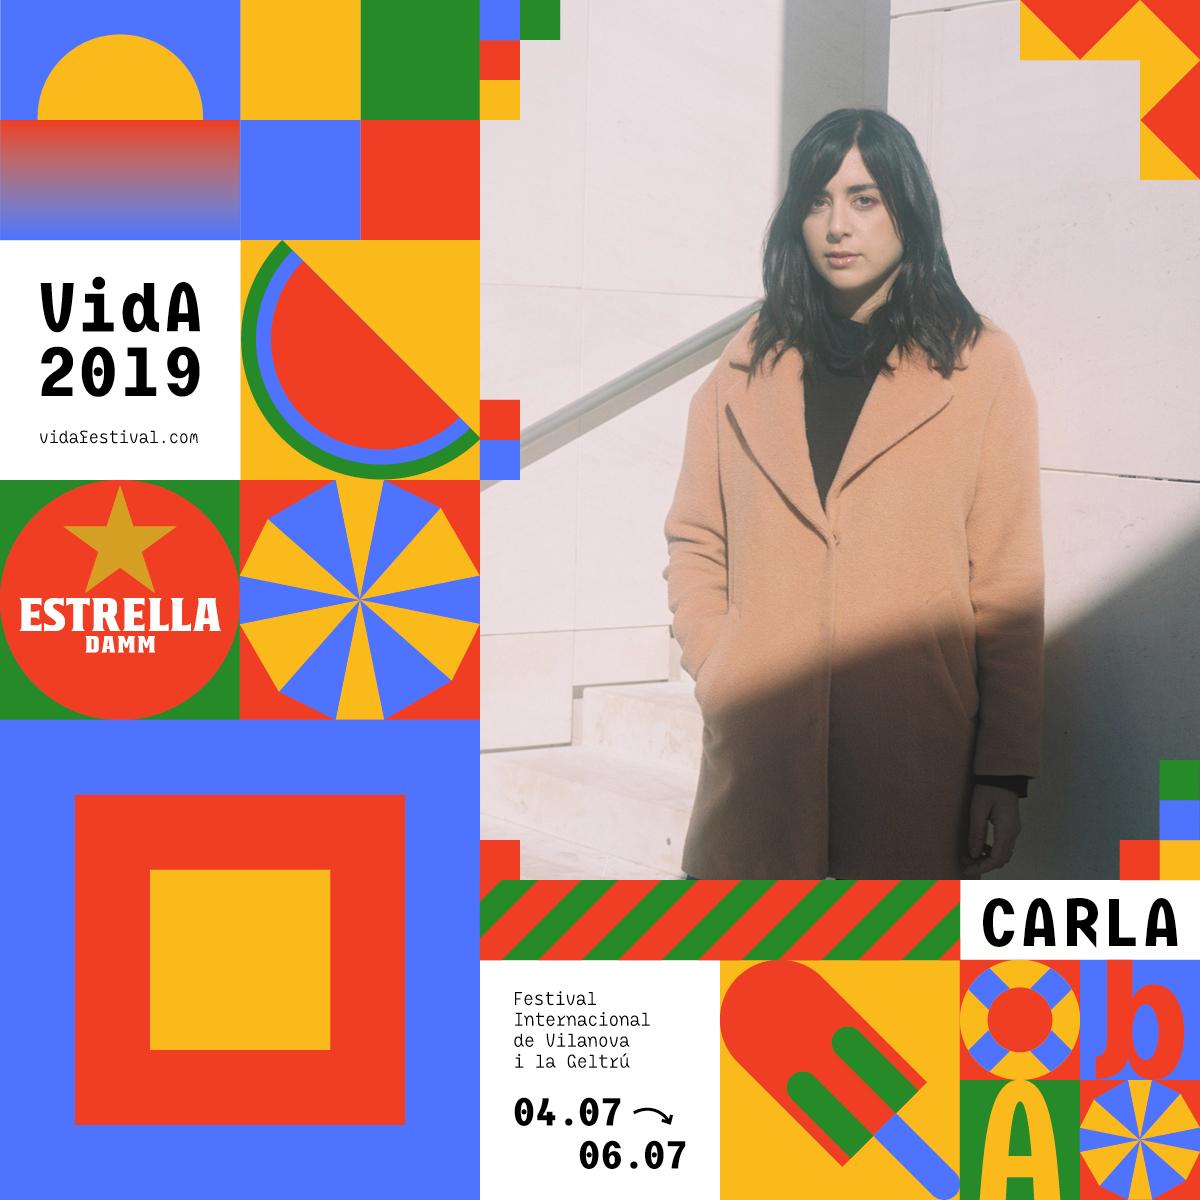 carla-1200x1200px.jpg